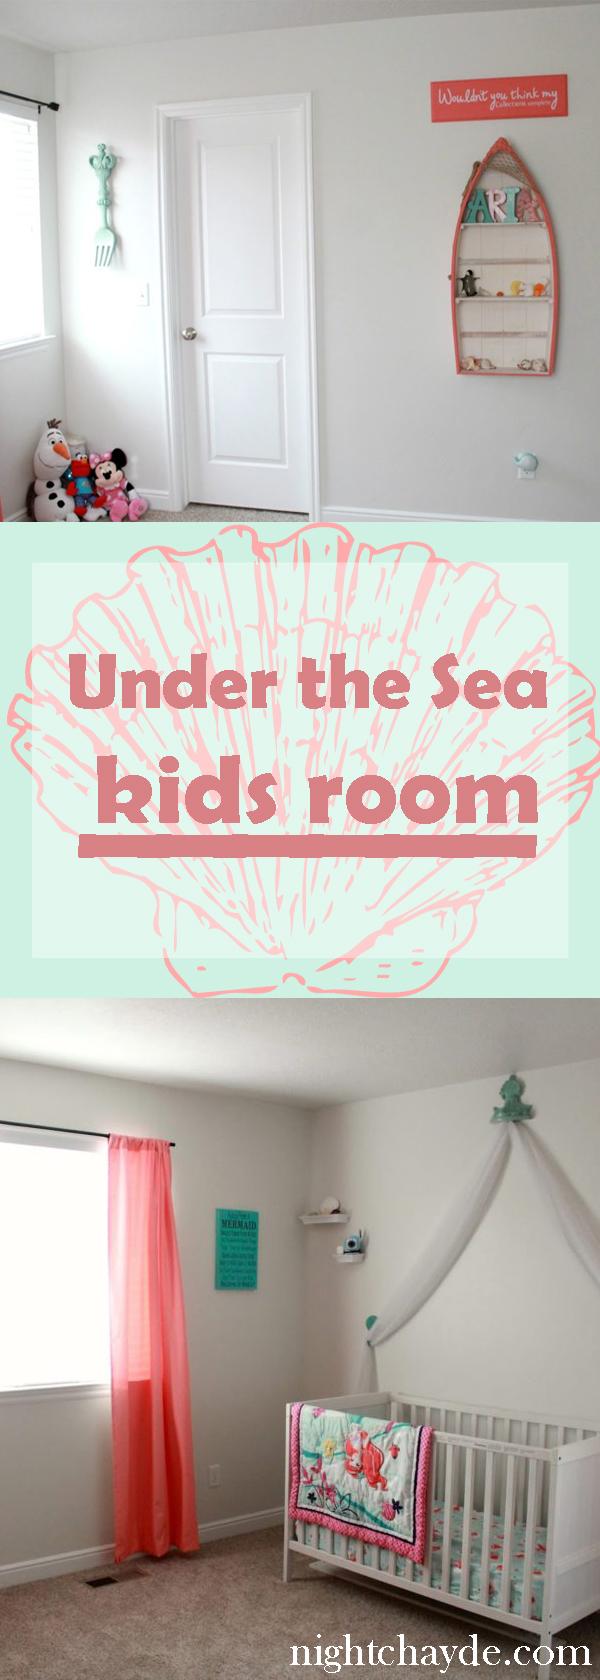 Under the Sea Kids Room